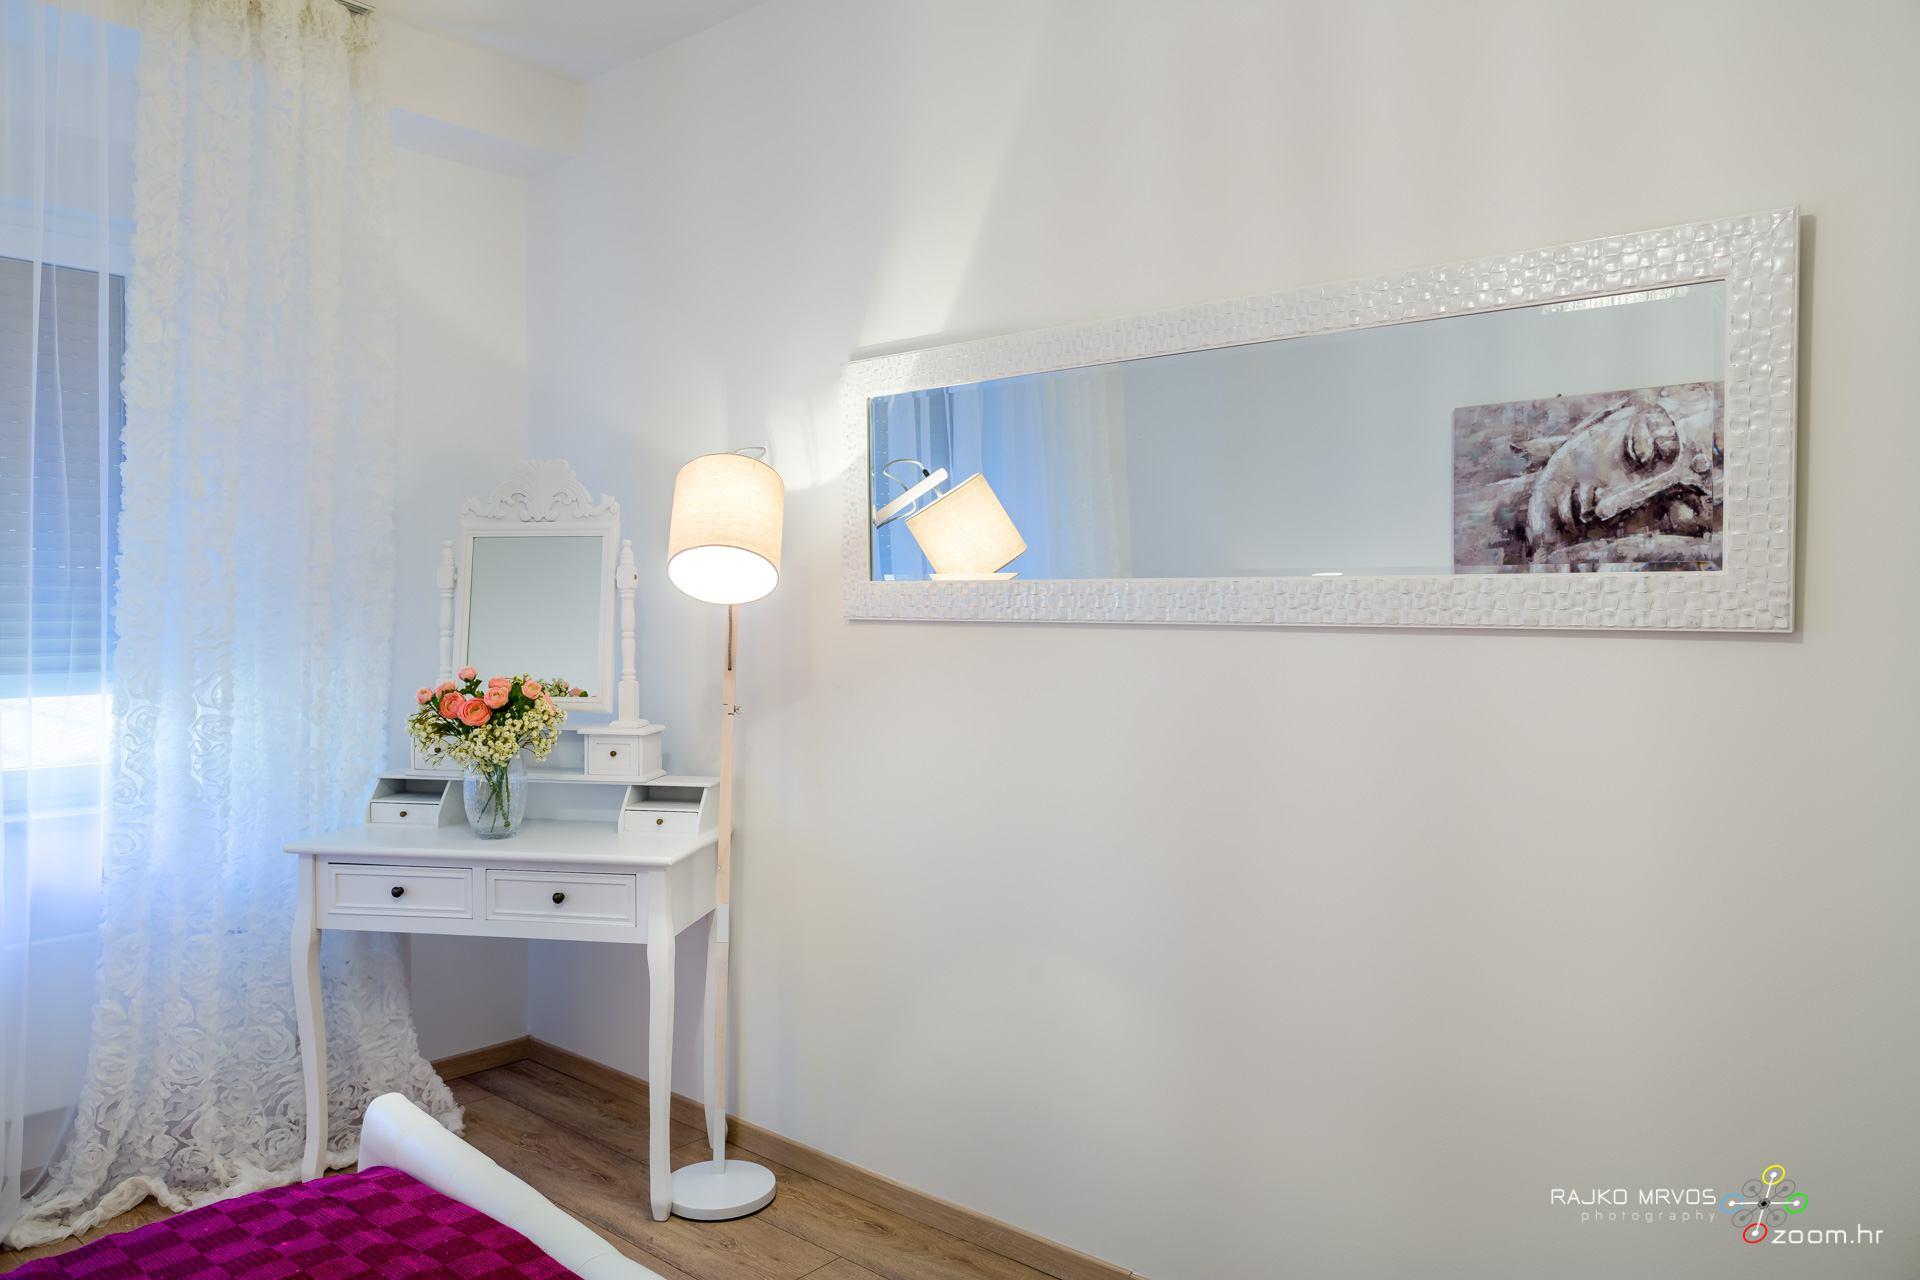 fotografiranje-interijera-fotograf-apartmana-vila-kuca-hotela-apartman-Gabby-Rijeka-17